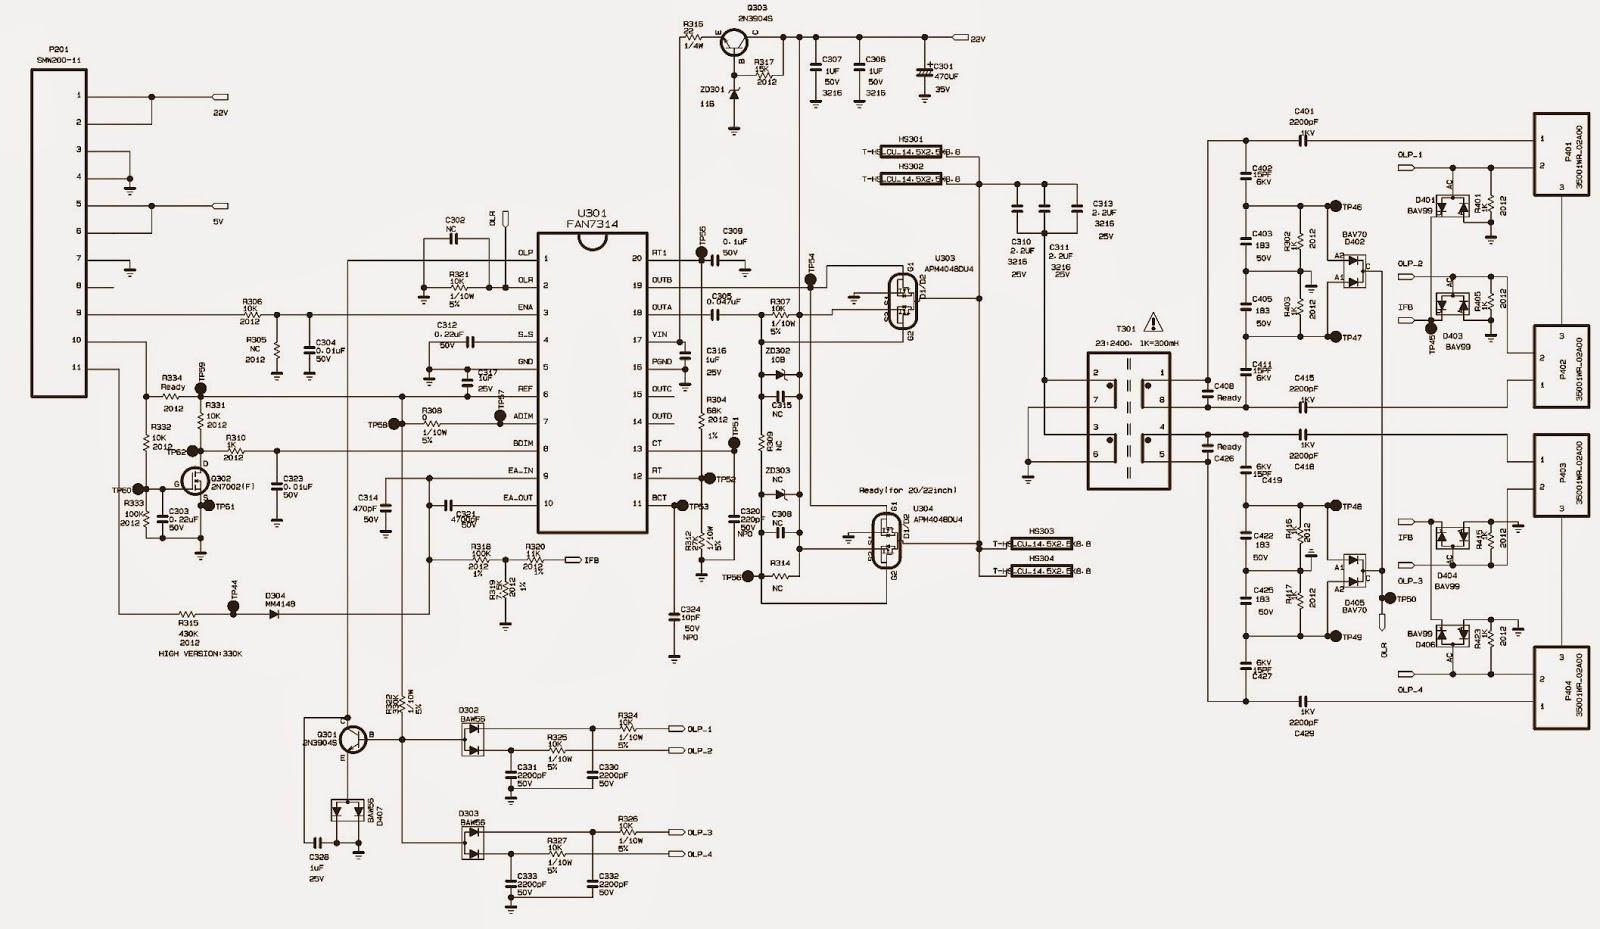 small resolution of lg fridge wiring diagrams gallery lg flatron w1942s lcd monitor u2013 aocl32w831 u2013 philco28t35dg